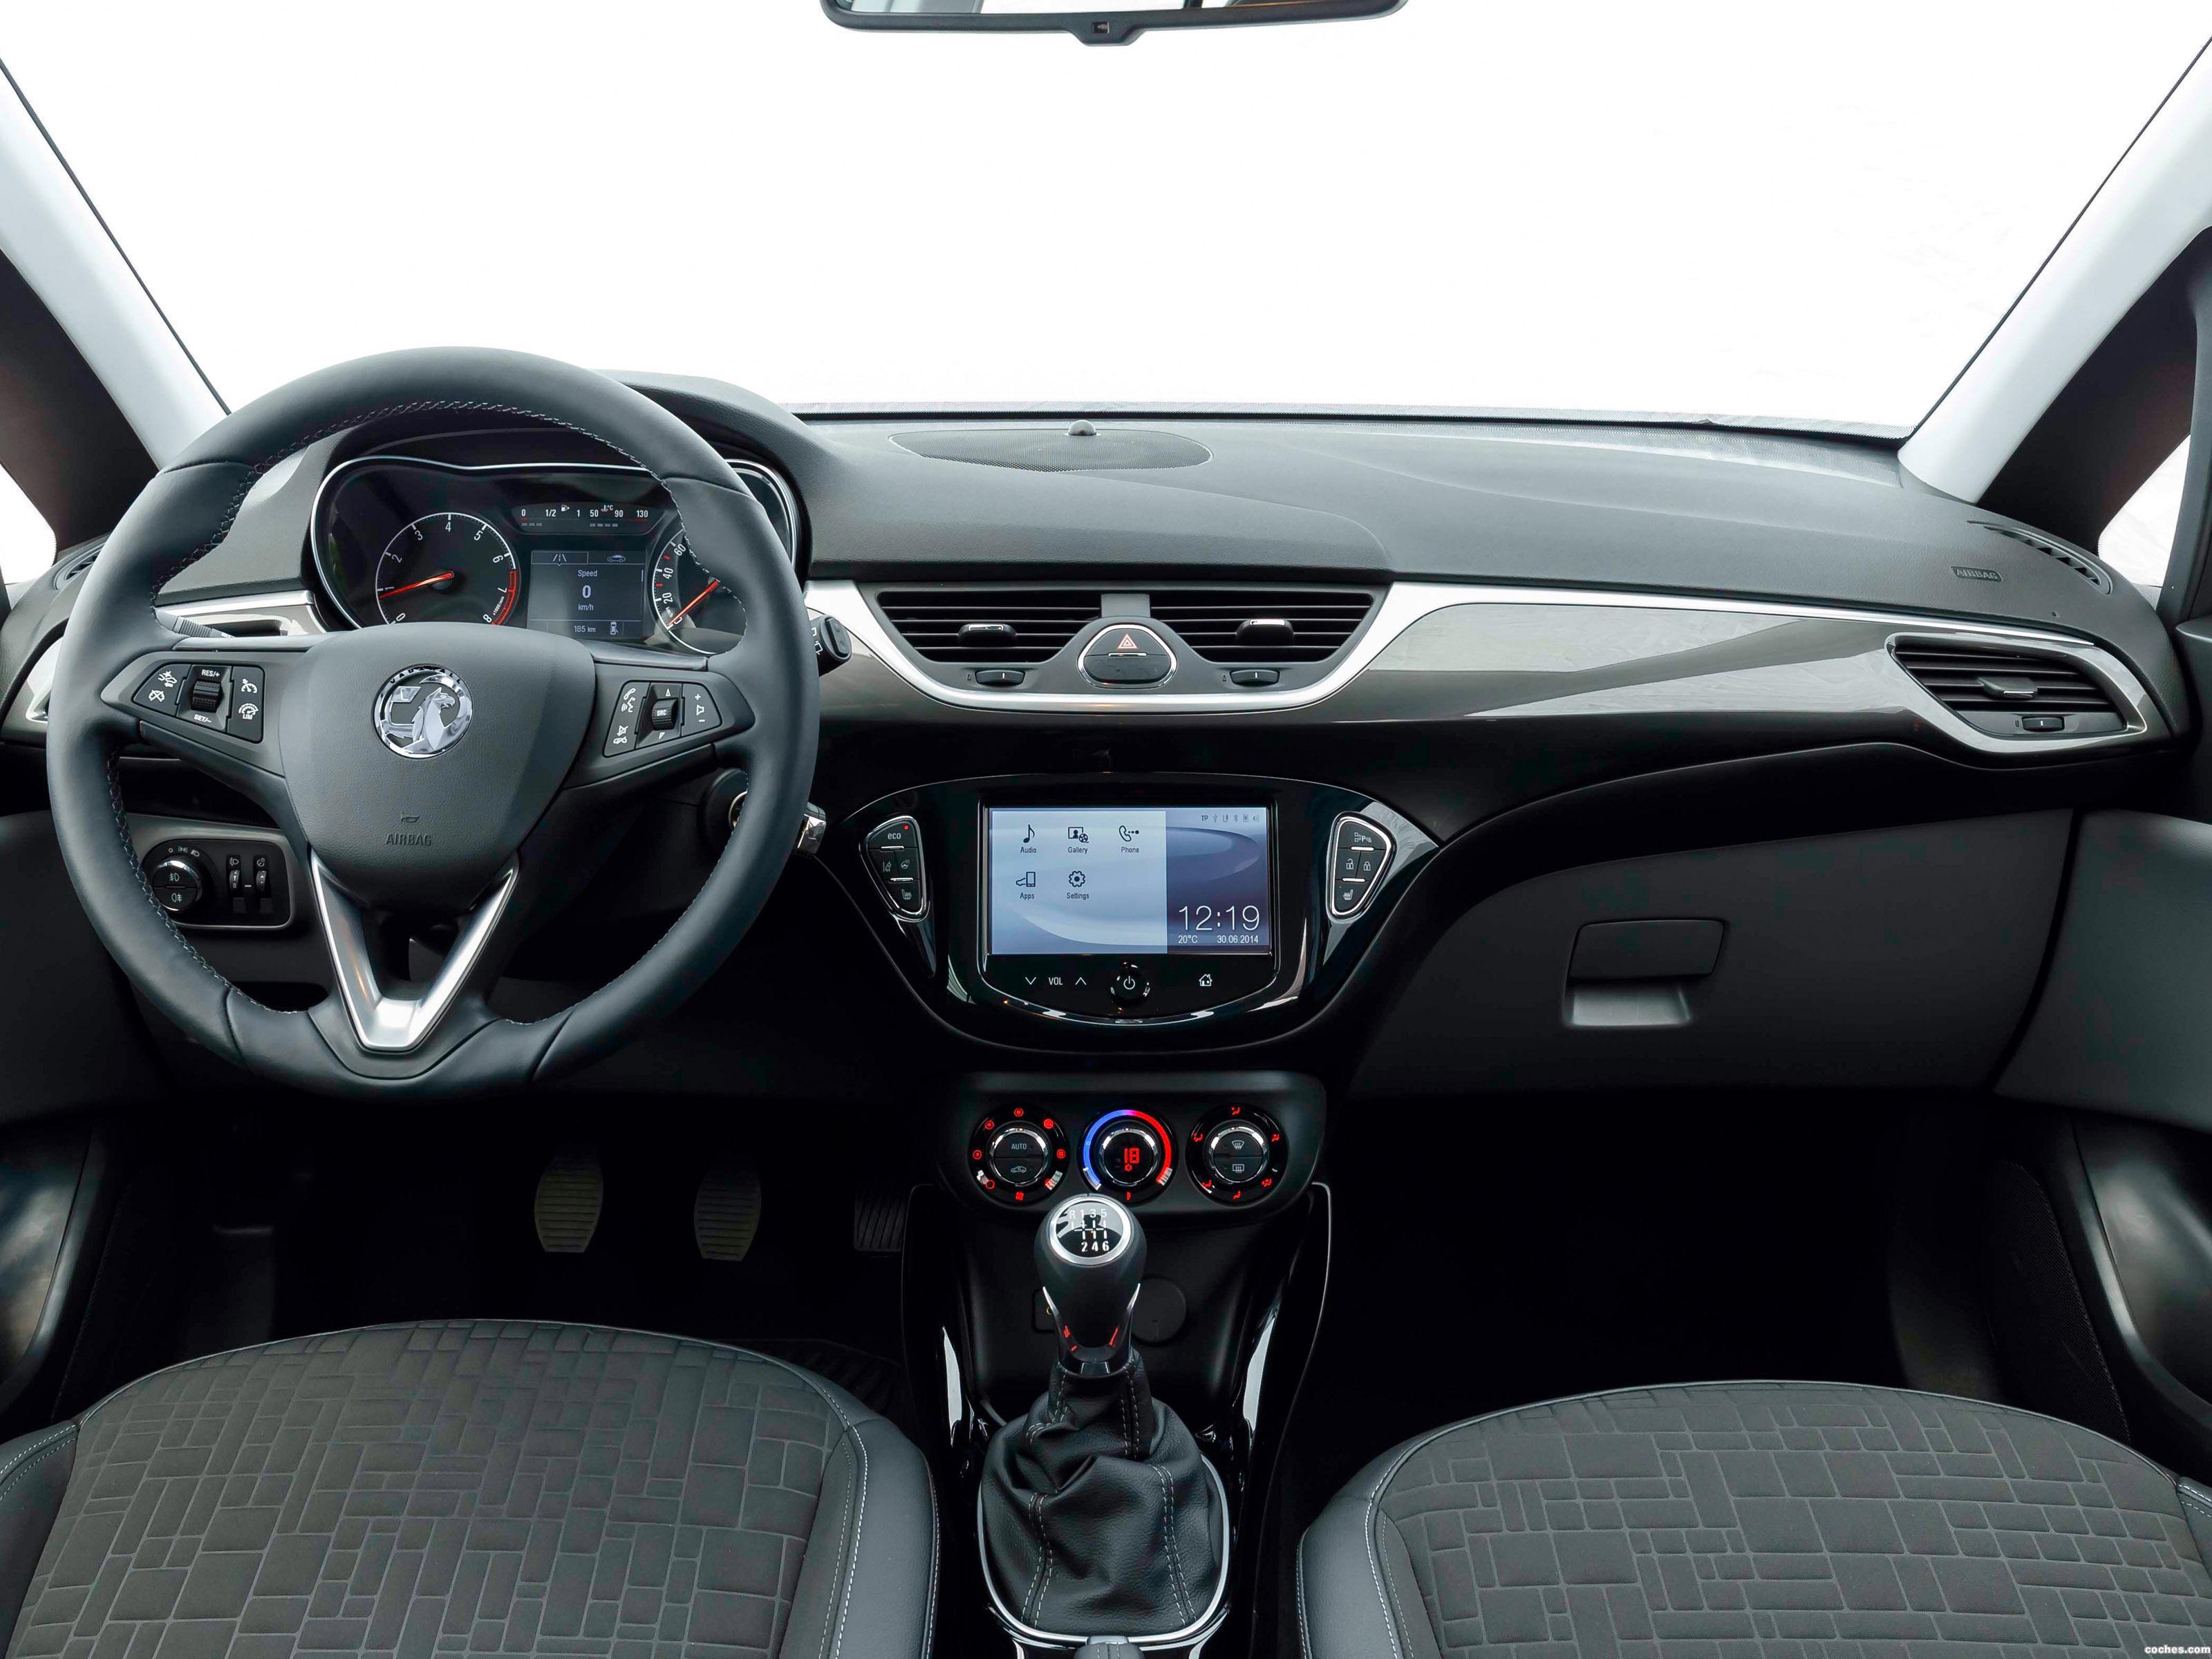 Foto 11 de Vauxhall Corsa 5 puertas 2014